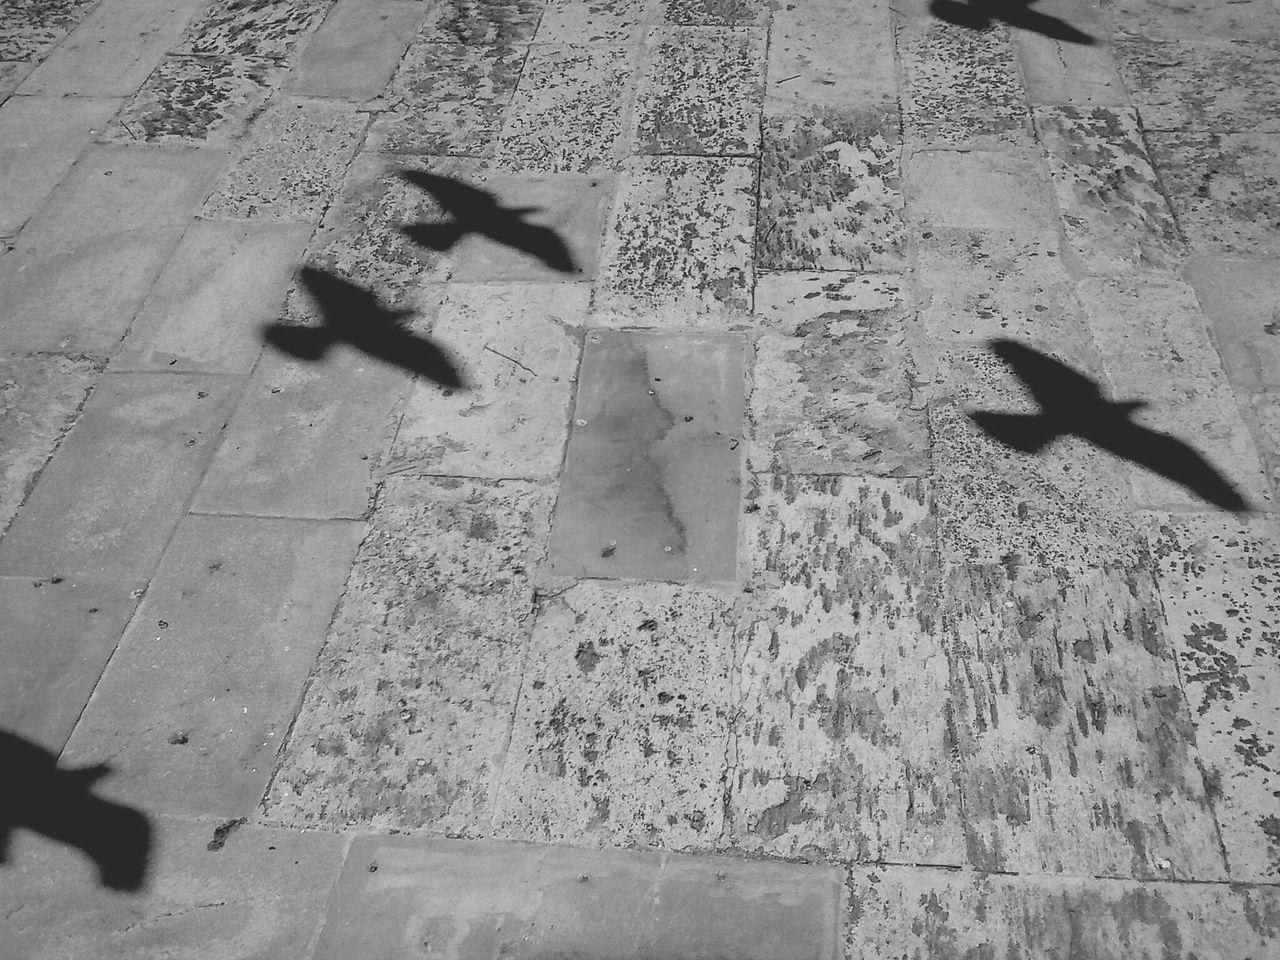 Shadow of birds flying on stone floor